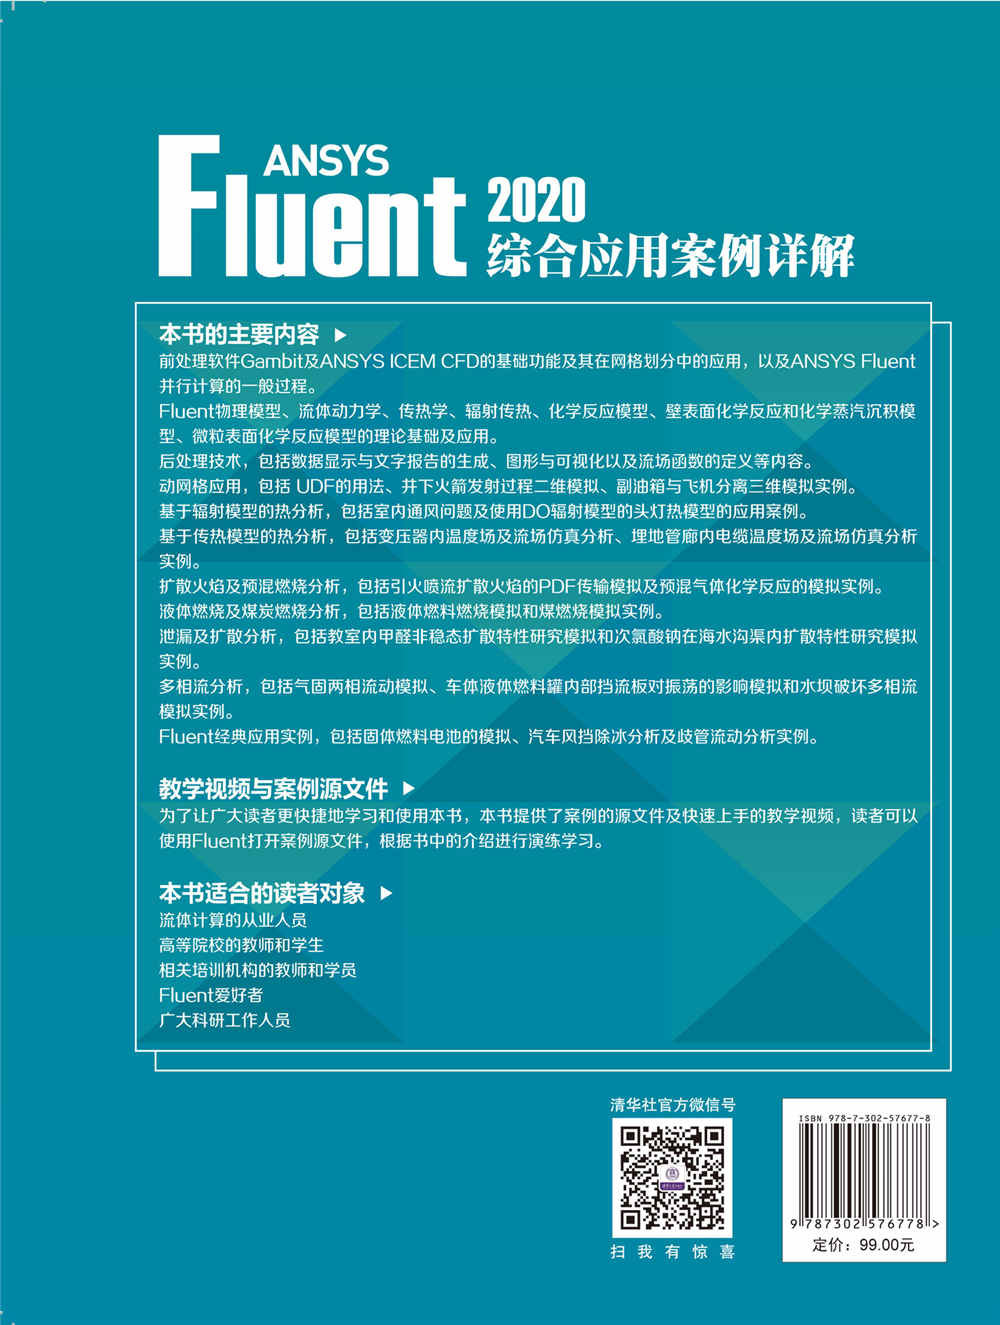 ANSYS Fluent 2020 綜合應用案例詳解-preview-2